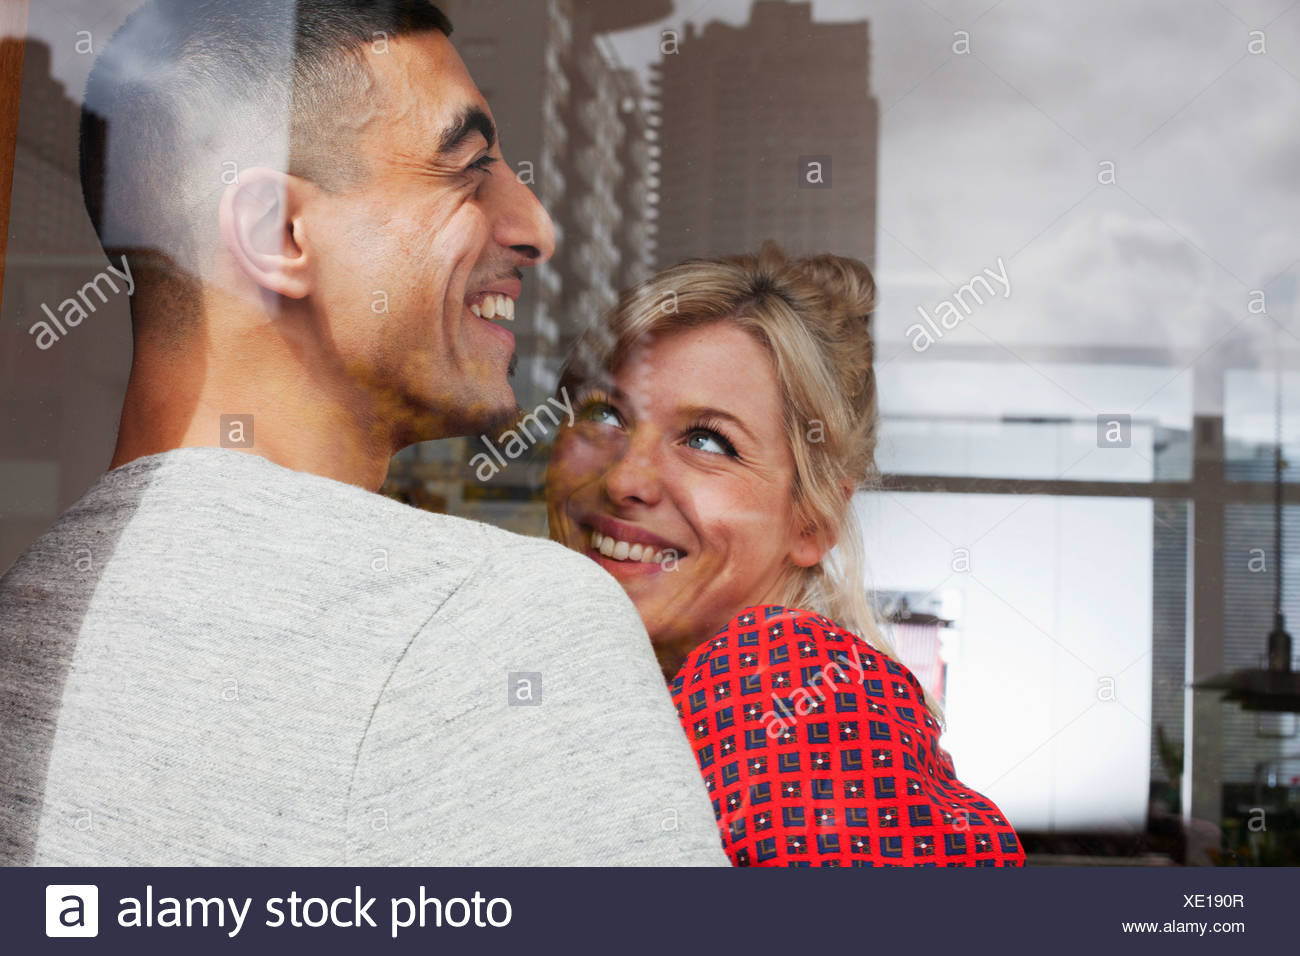 Young couple through window - Stock Image